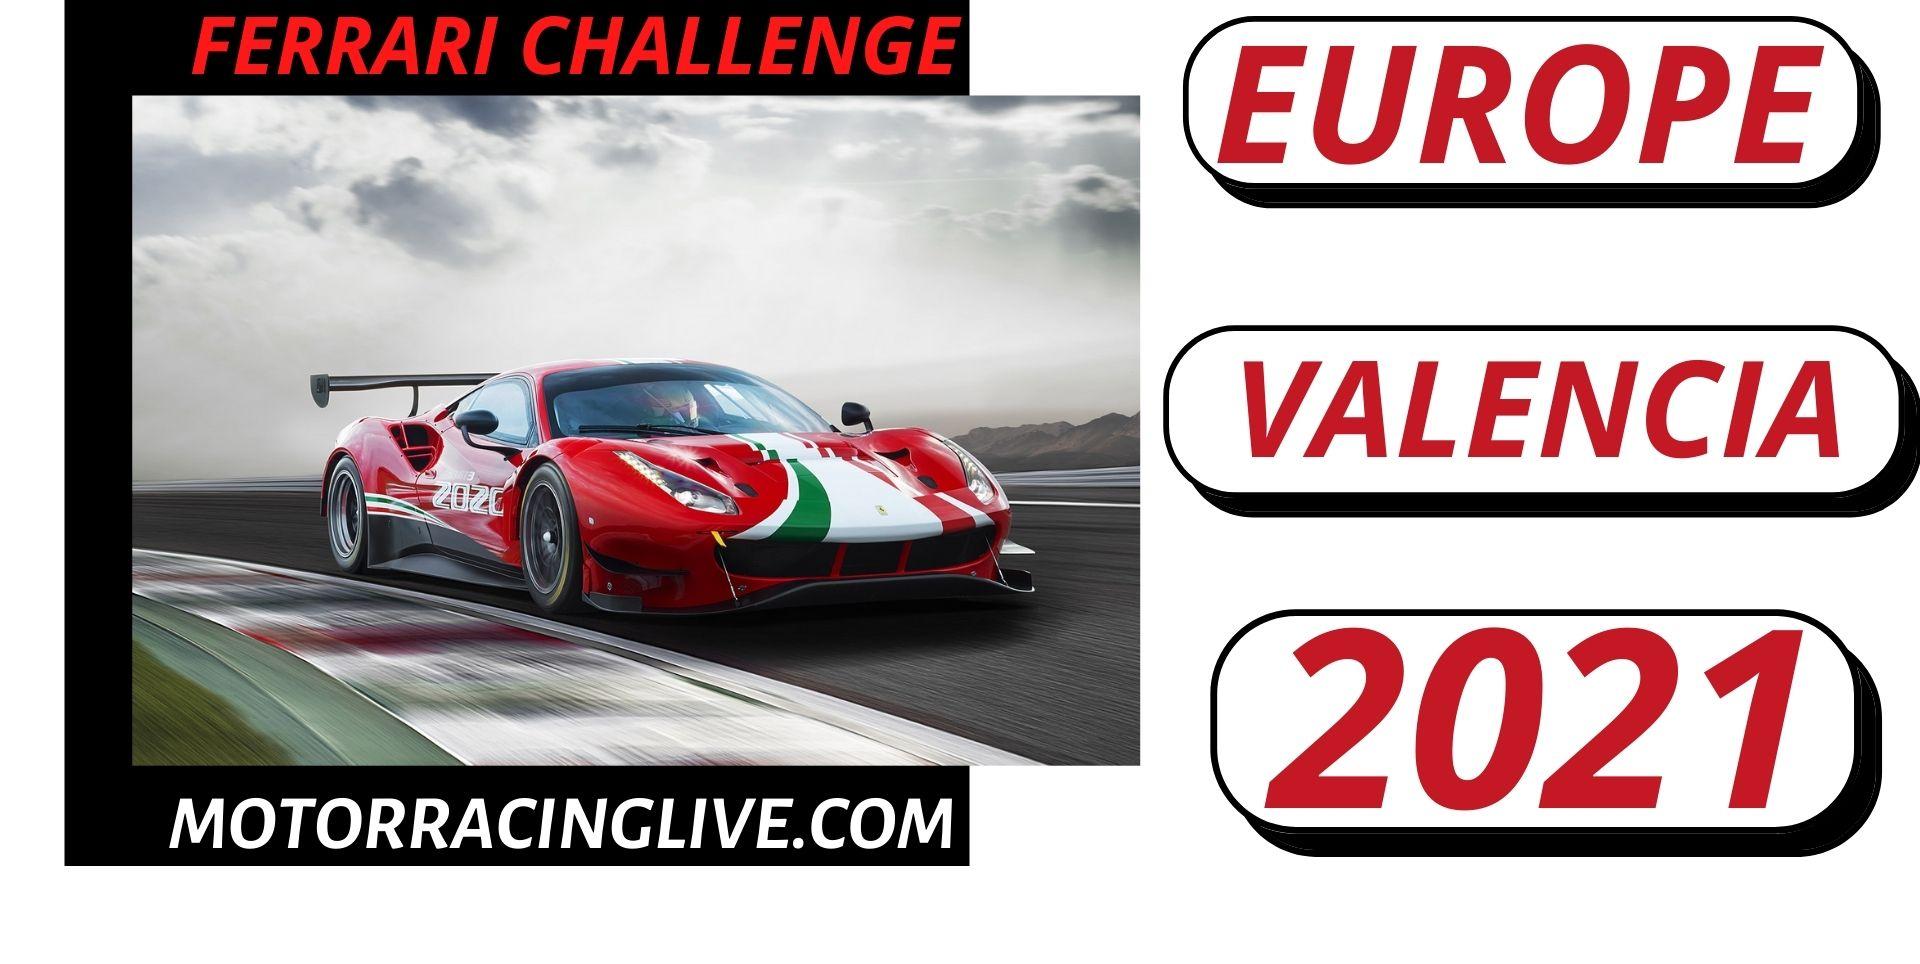 Valencia Ferrari Challenge Europe Live Stream 2021